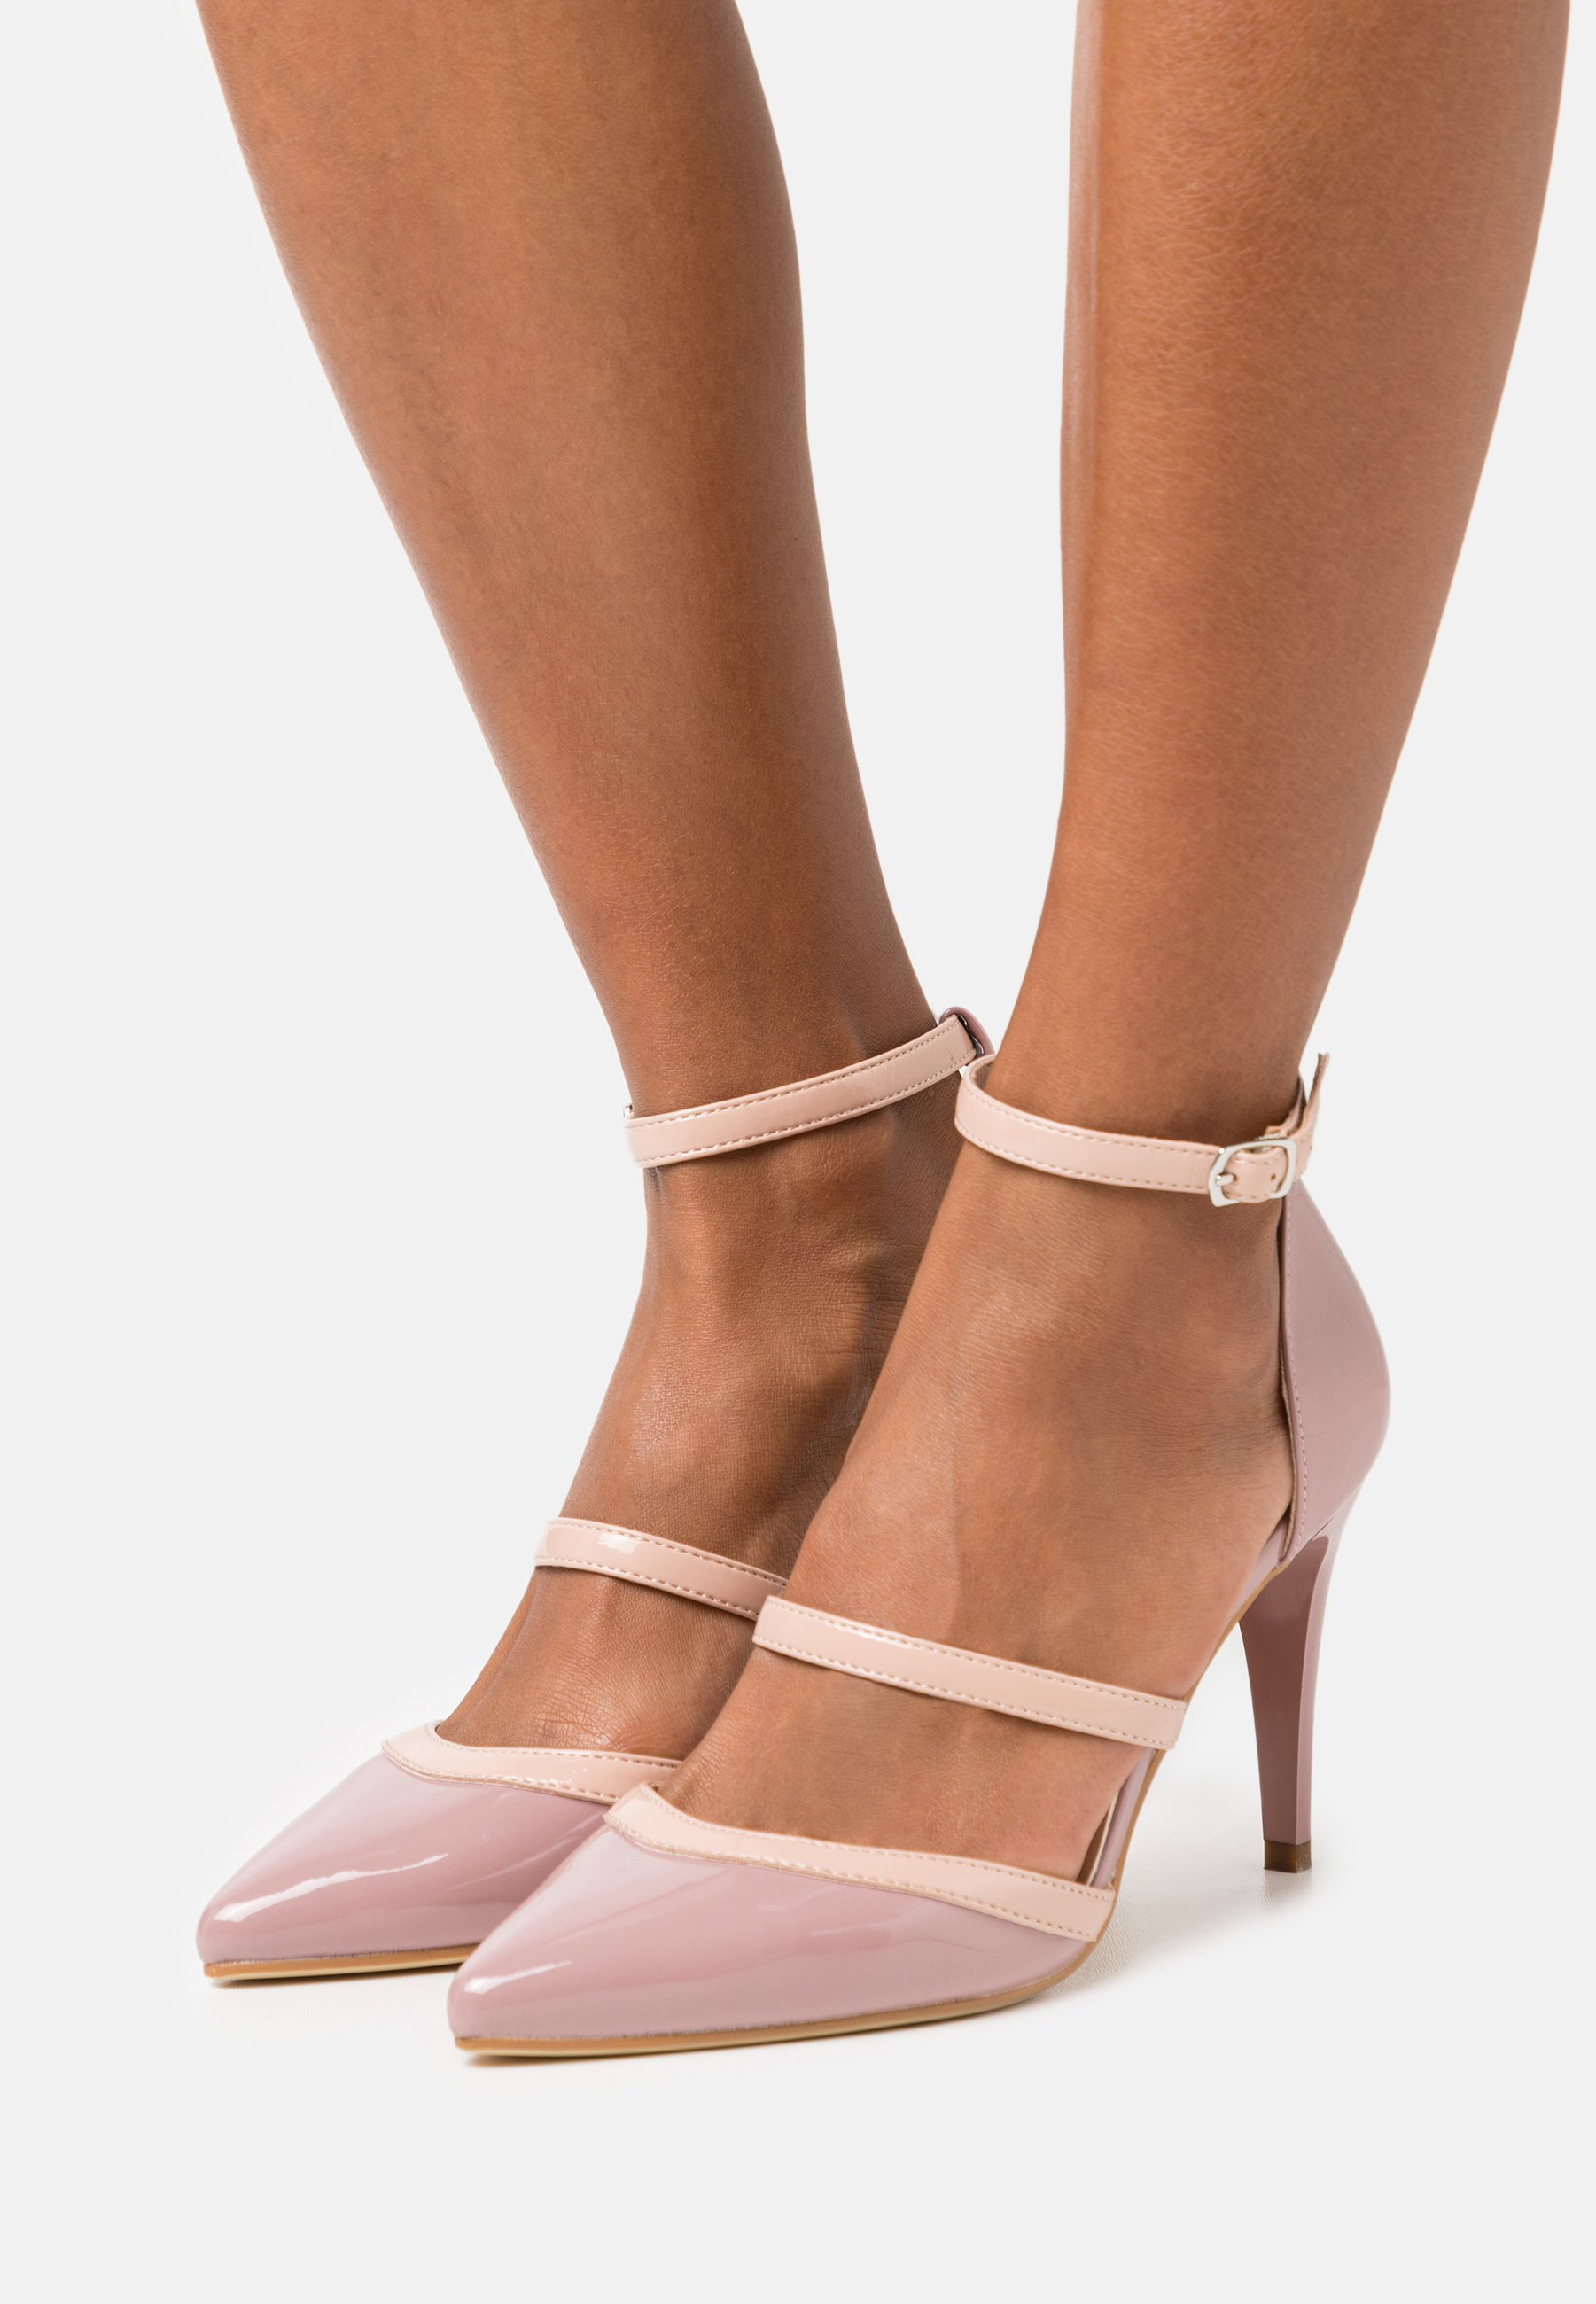 Damen High Heel Pumps - lilac